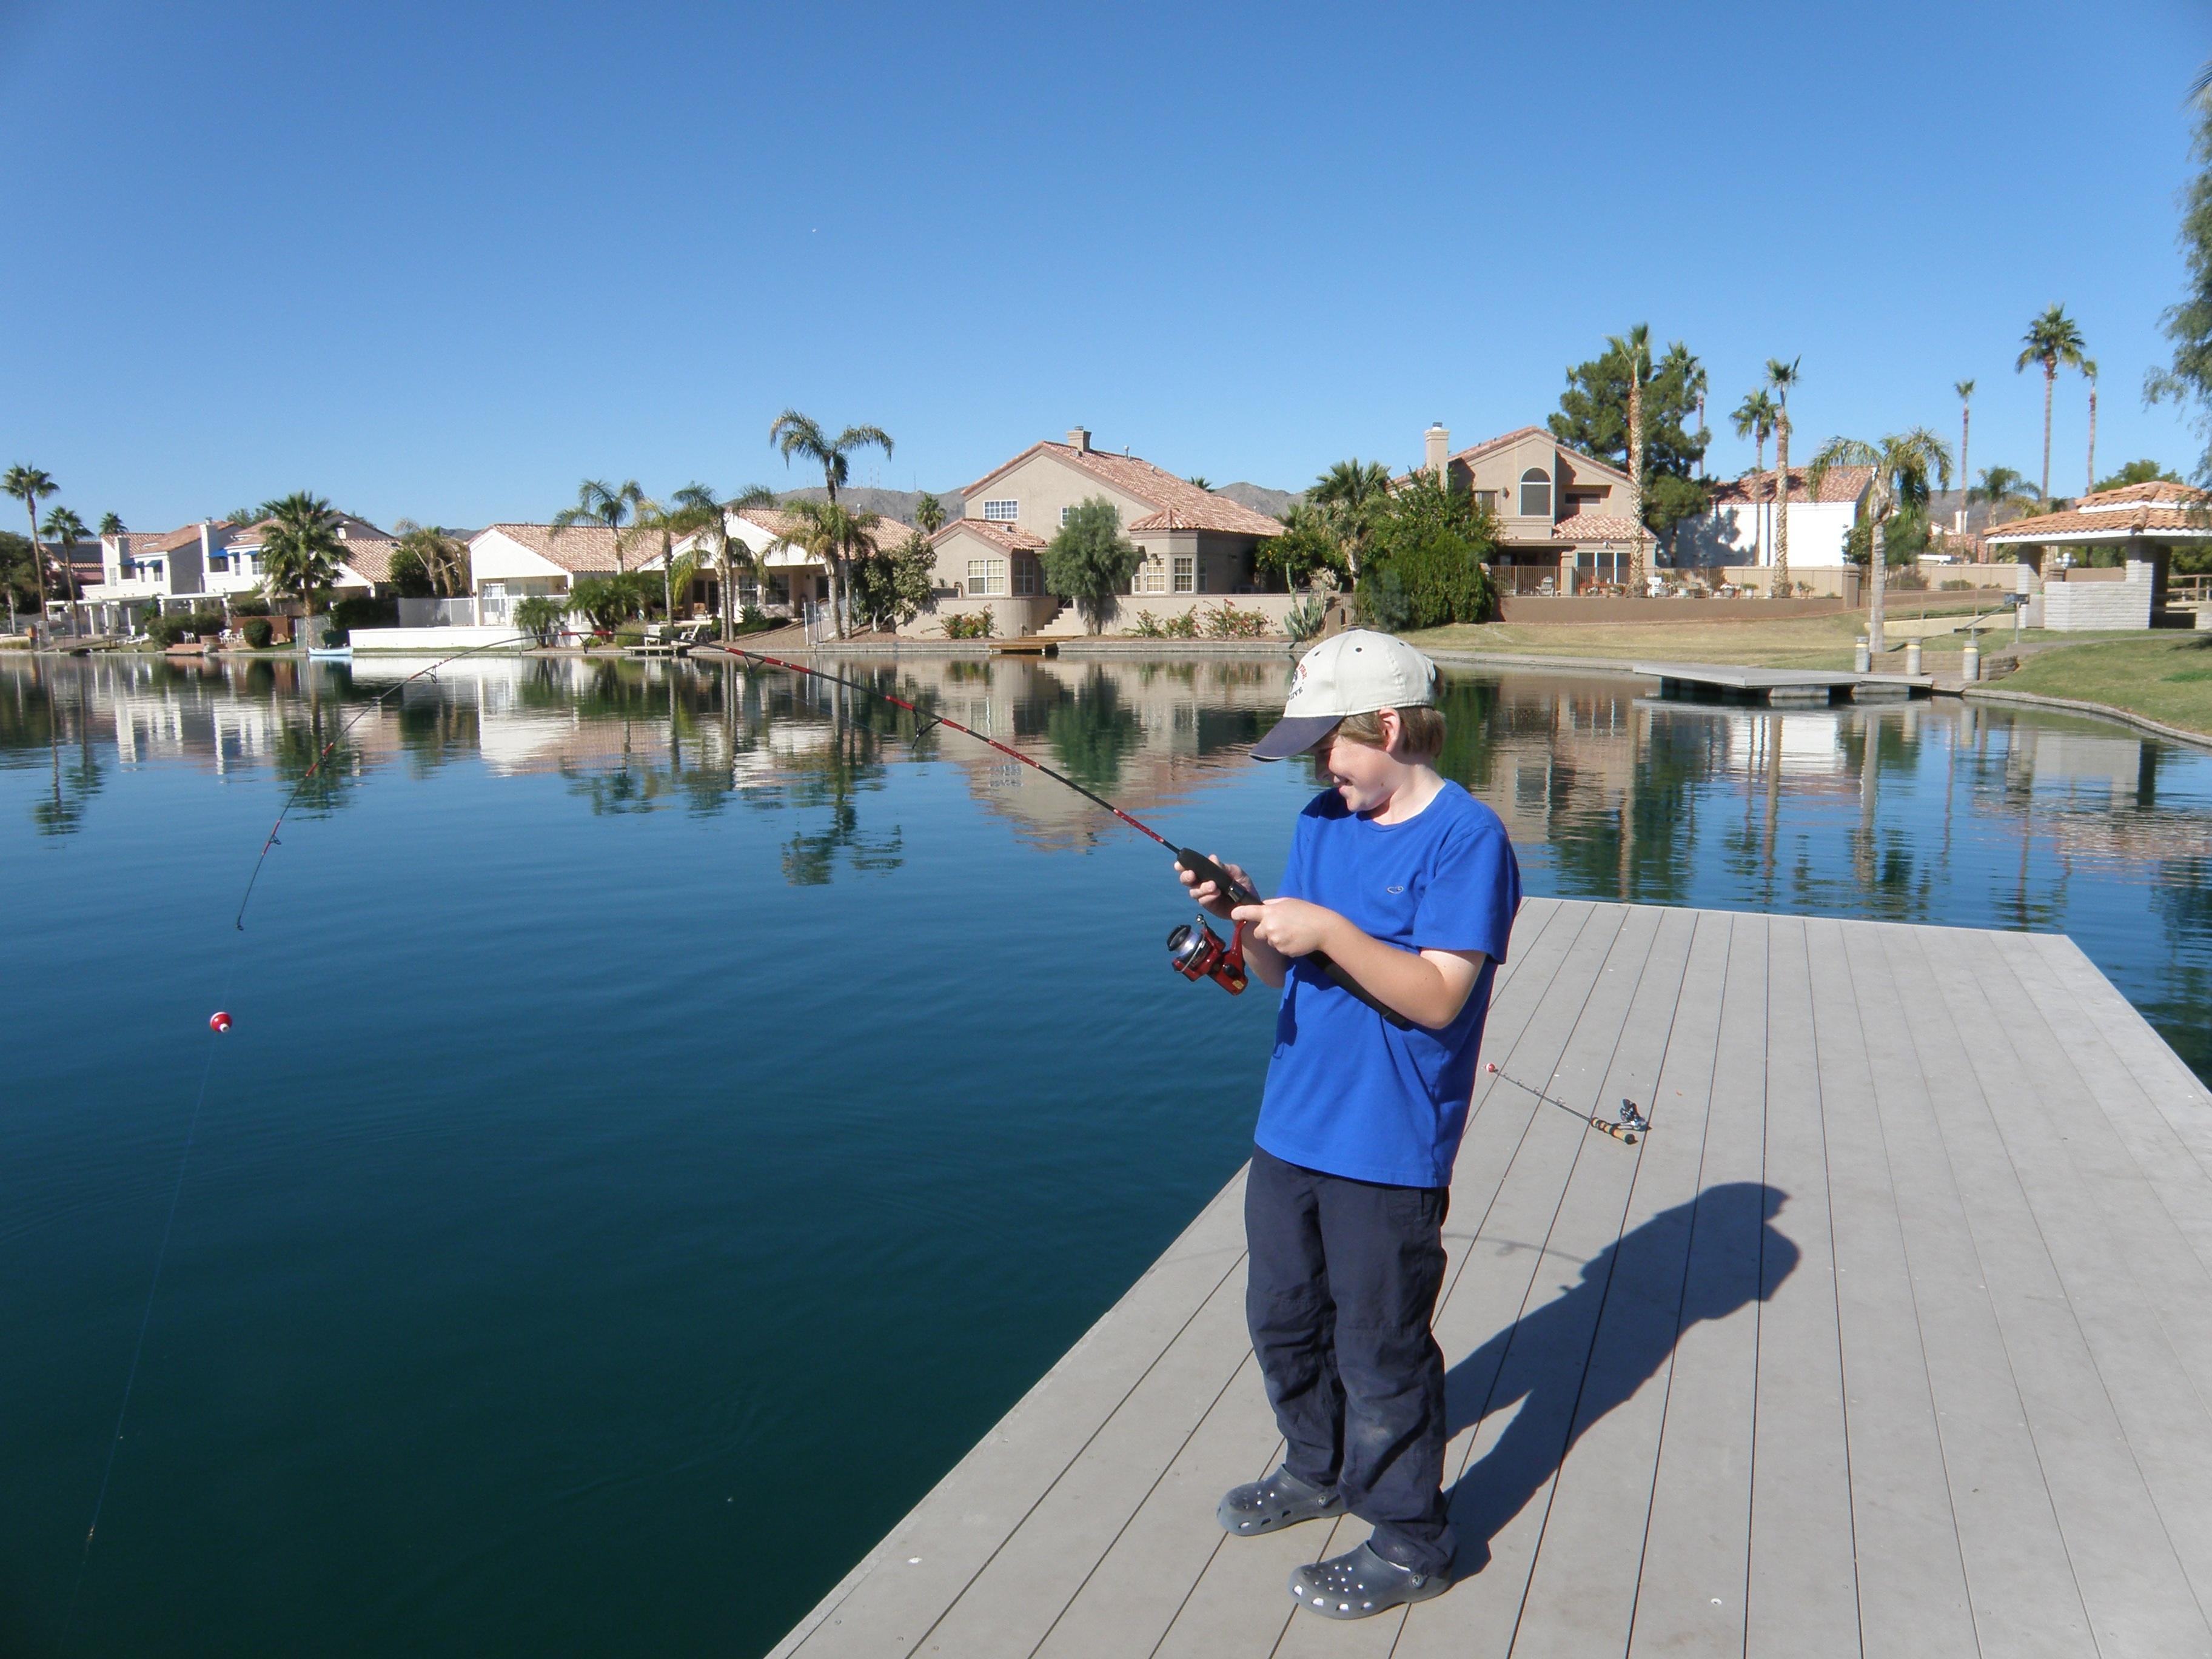 Fishing with scott in phoenix arvid 39 s fishing report for Fishing in phoenix arizona